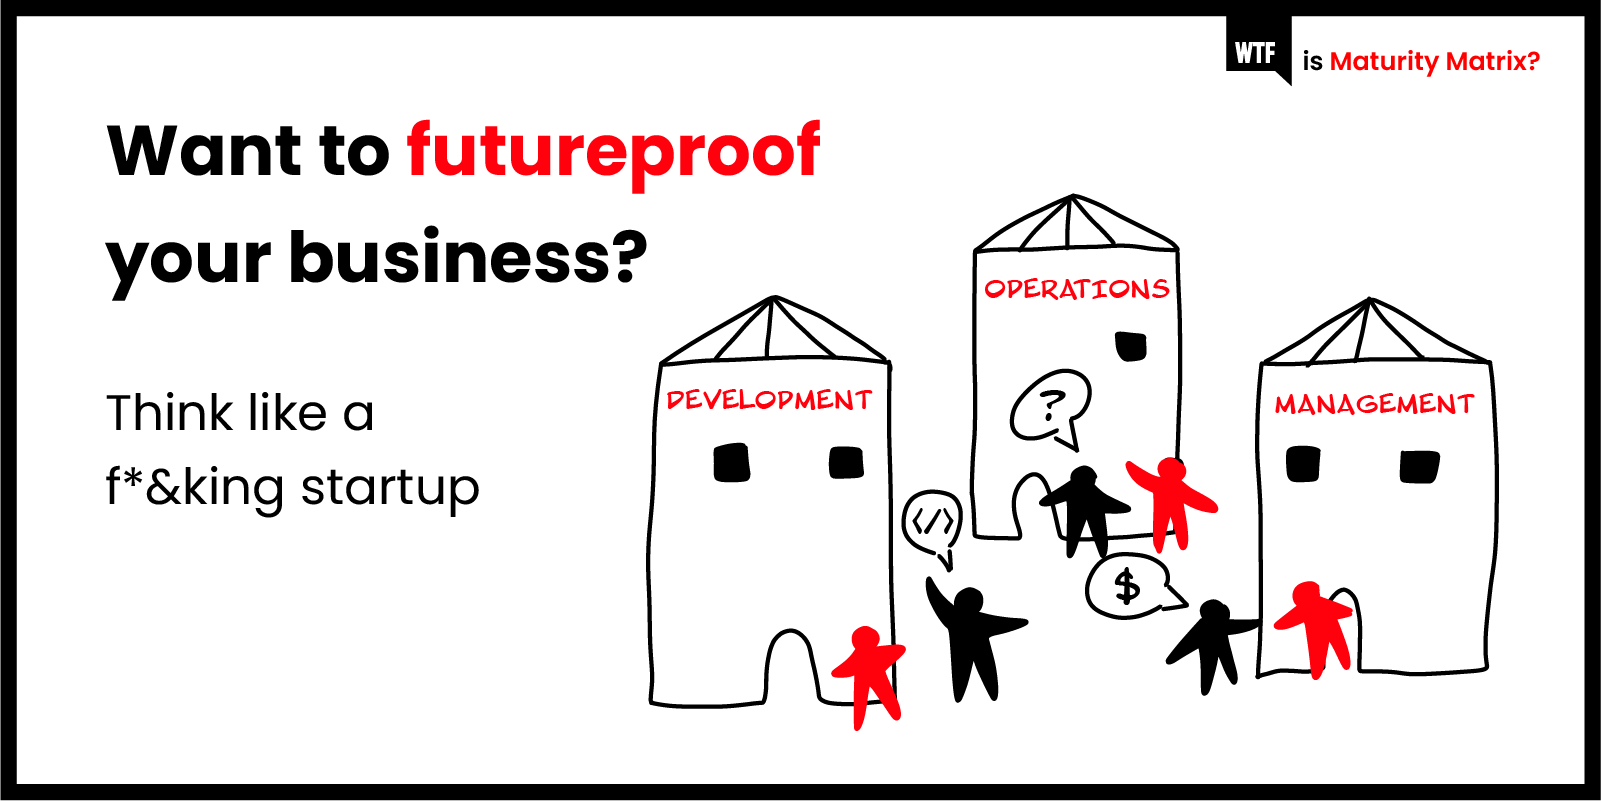 wtf-is-maturity-matrix-war-between-it-business copy-1